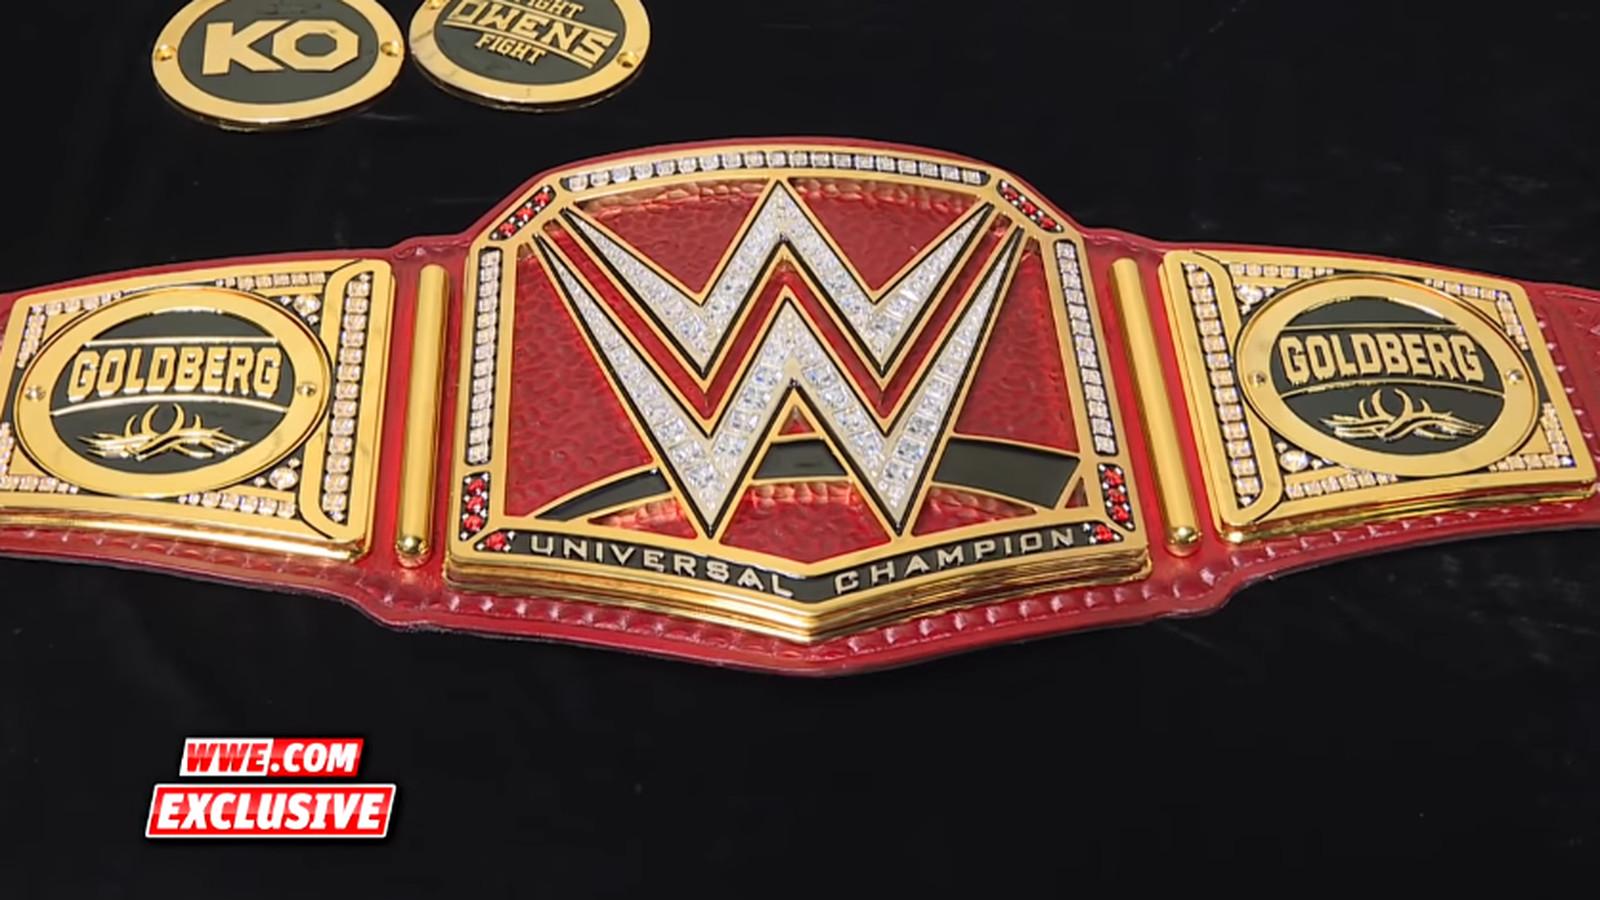 Goldberg Gets Custom Side Plates On Universal Championship